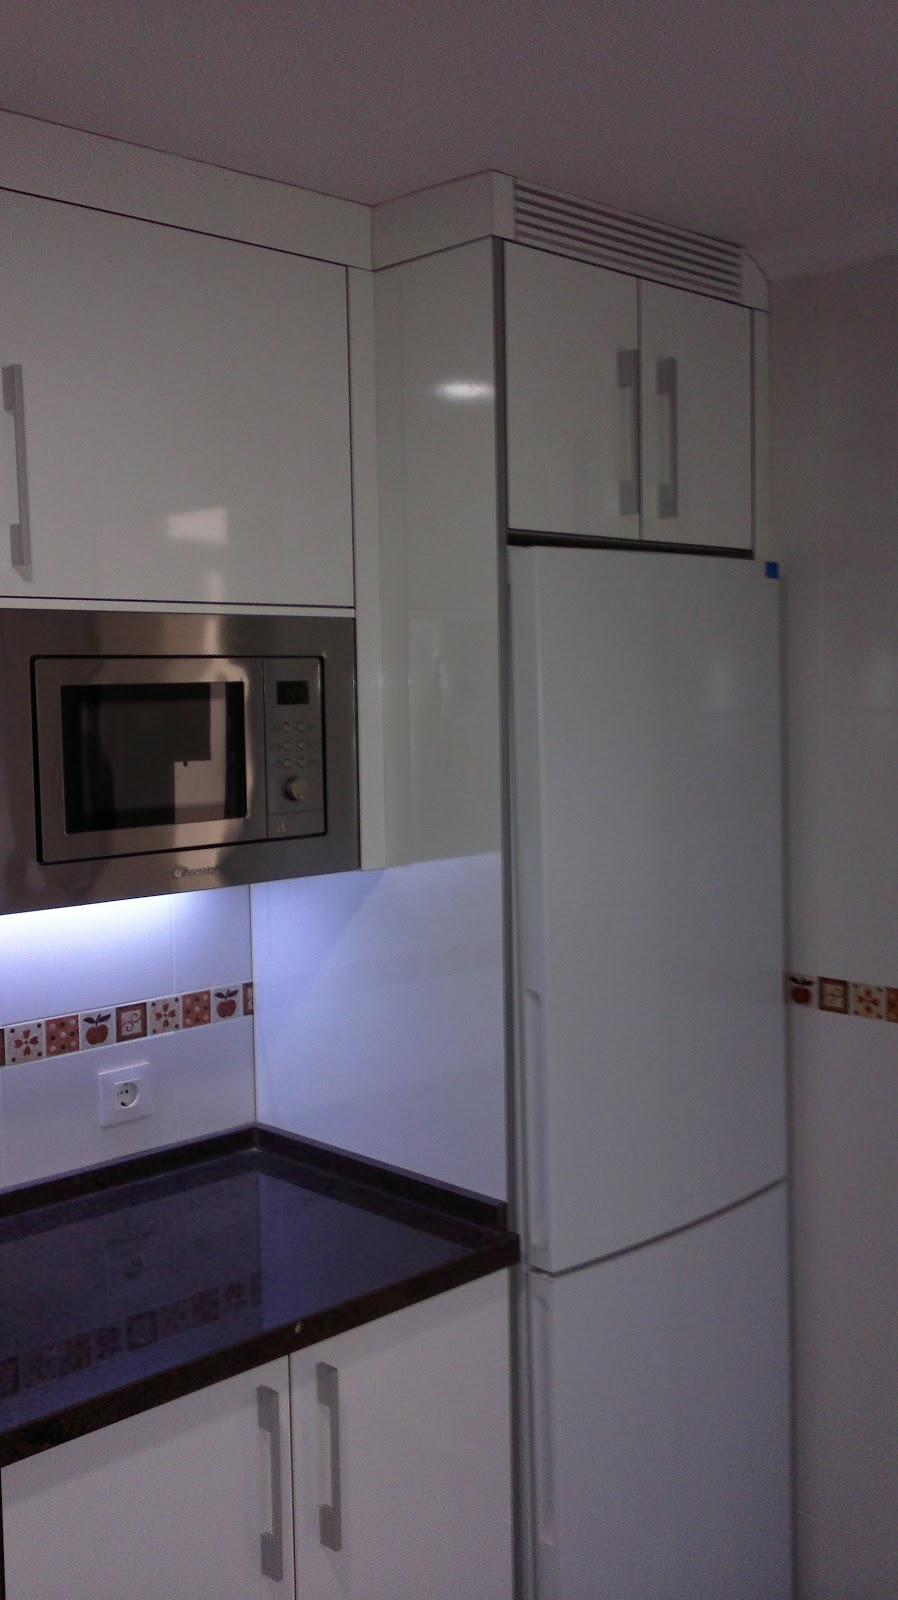 Muebles eduardo tallero muebles de cocina for Encimeras imitacion a silestone